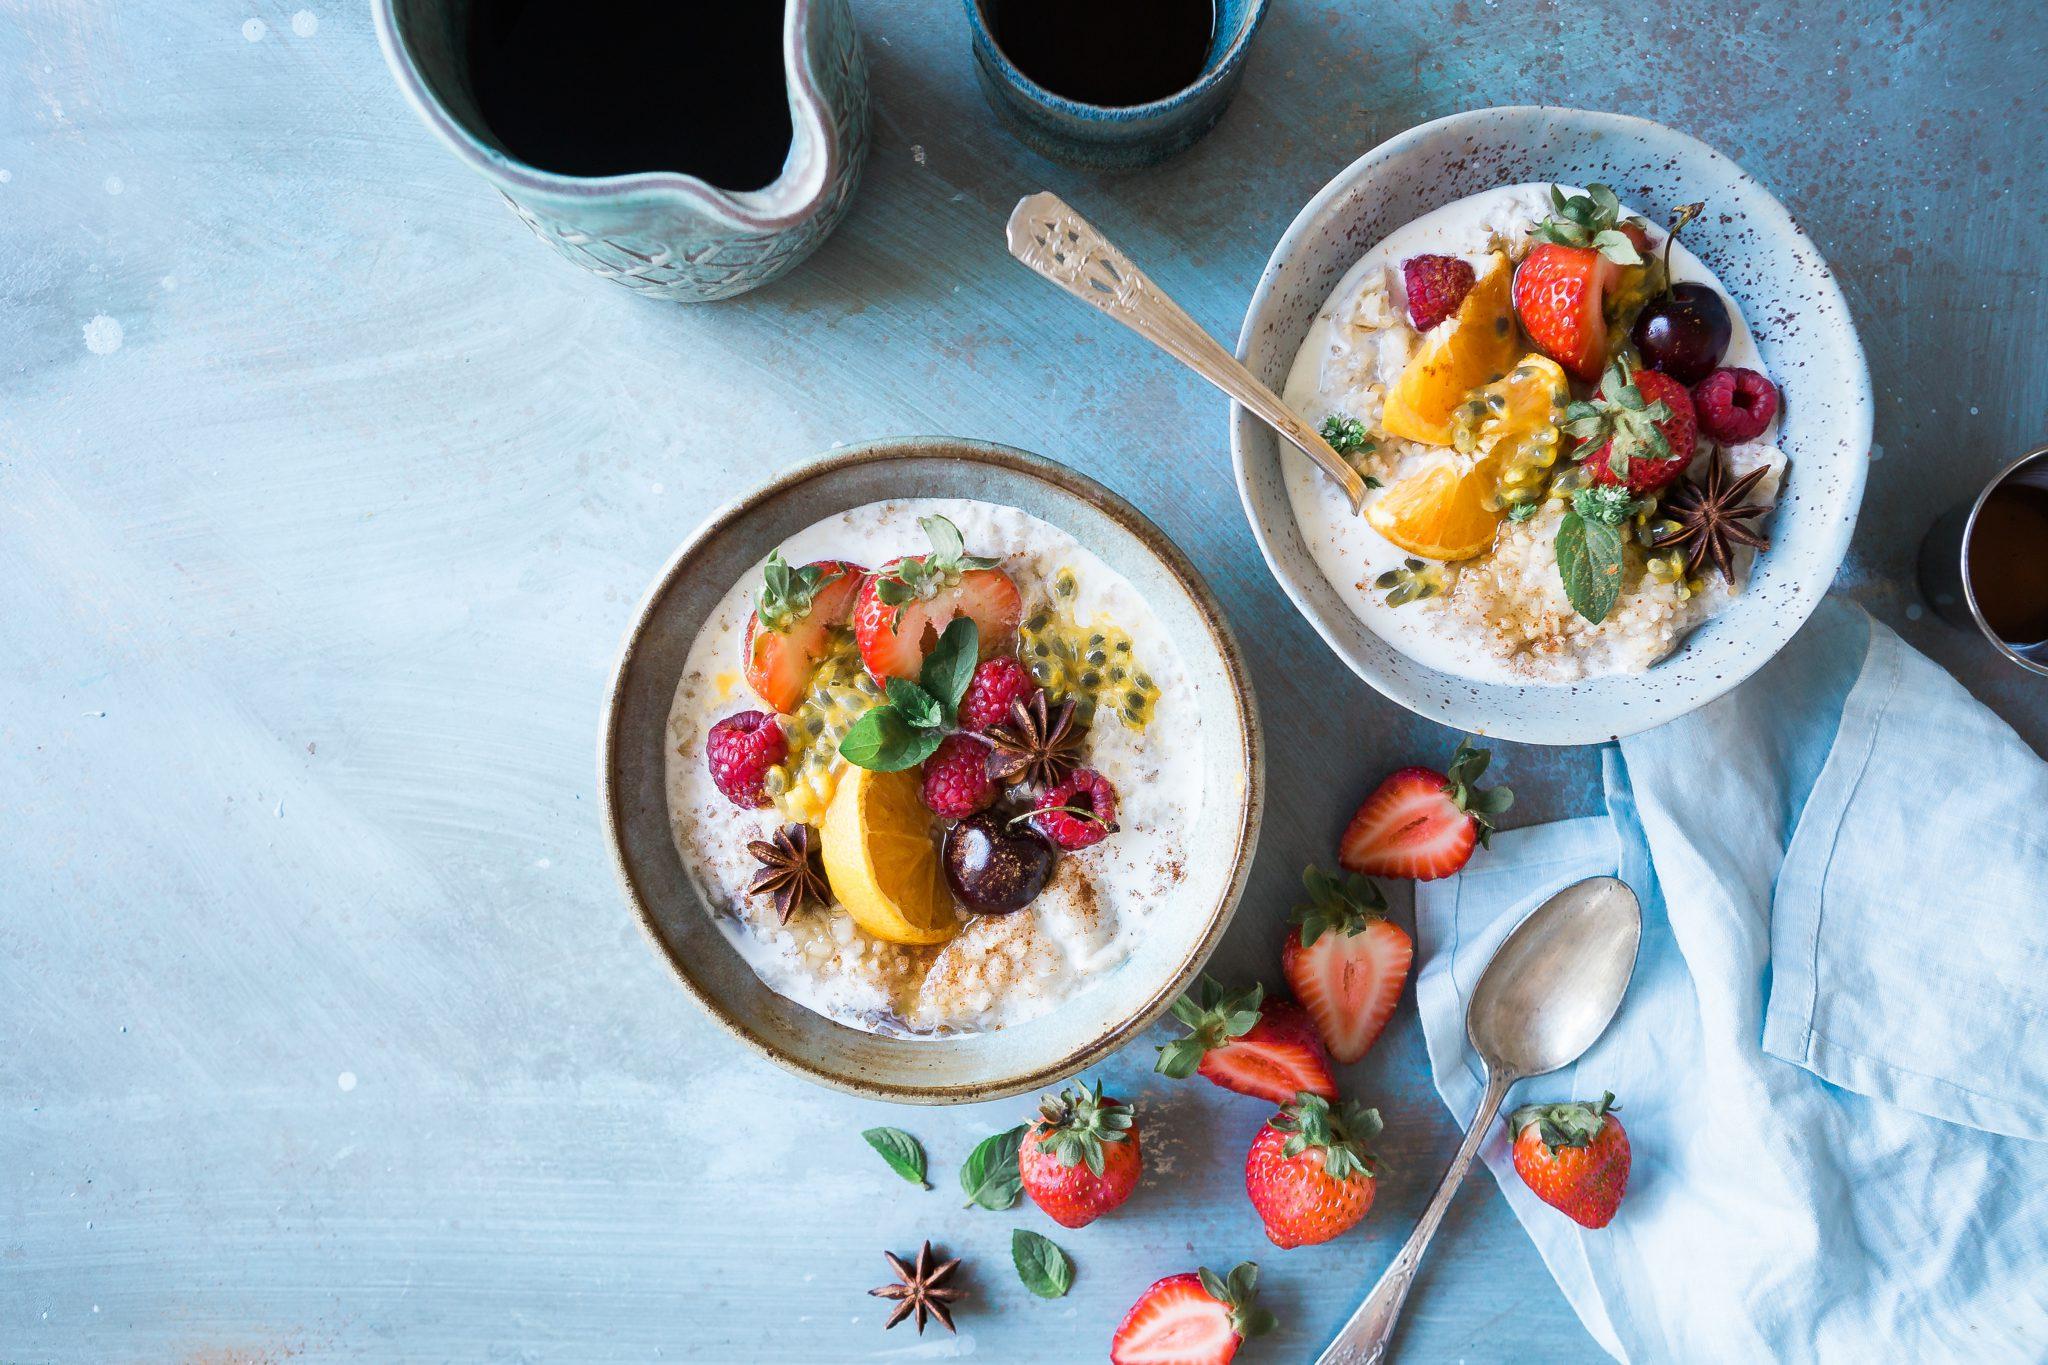 A bowl of porridge with fruit